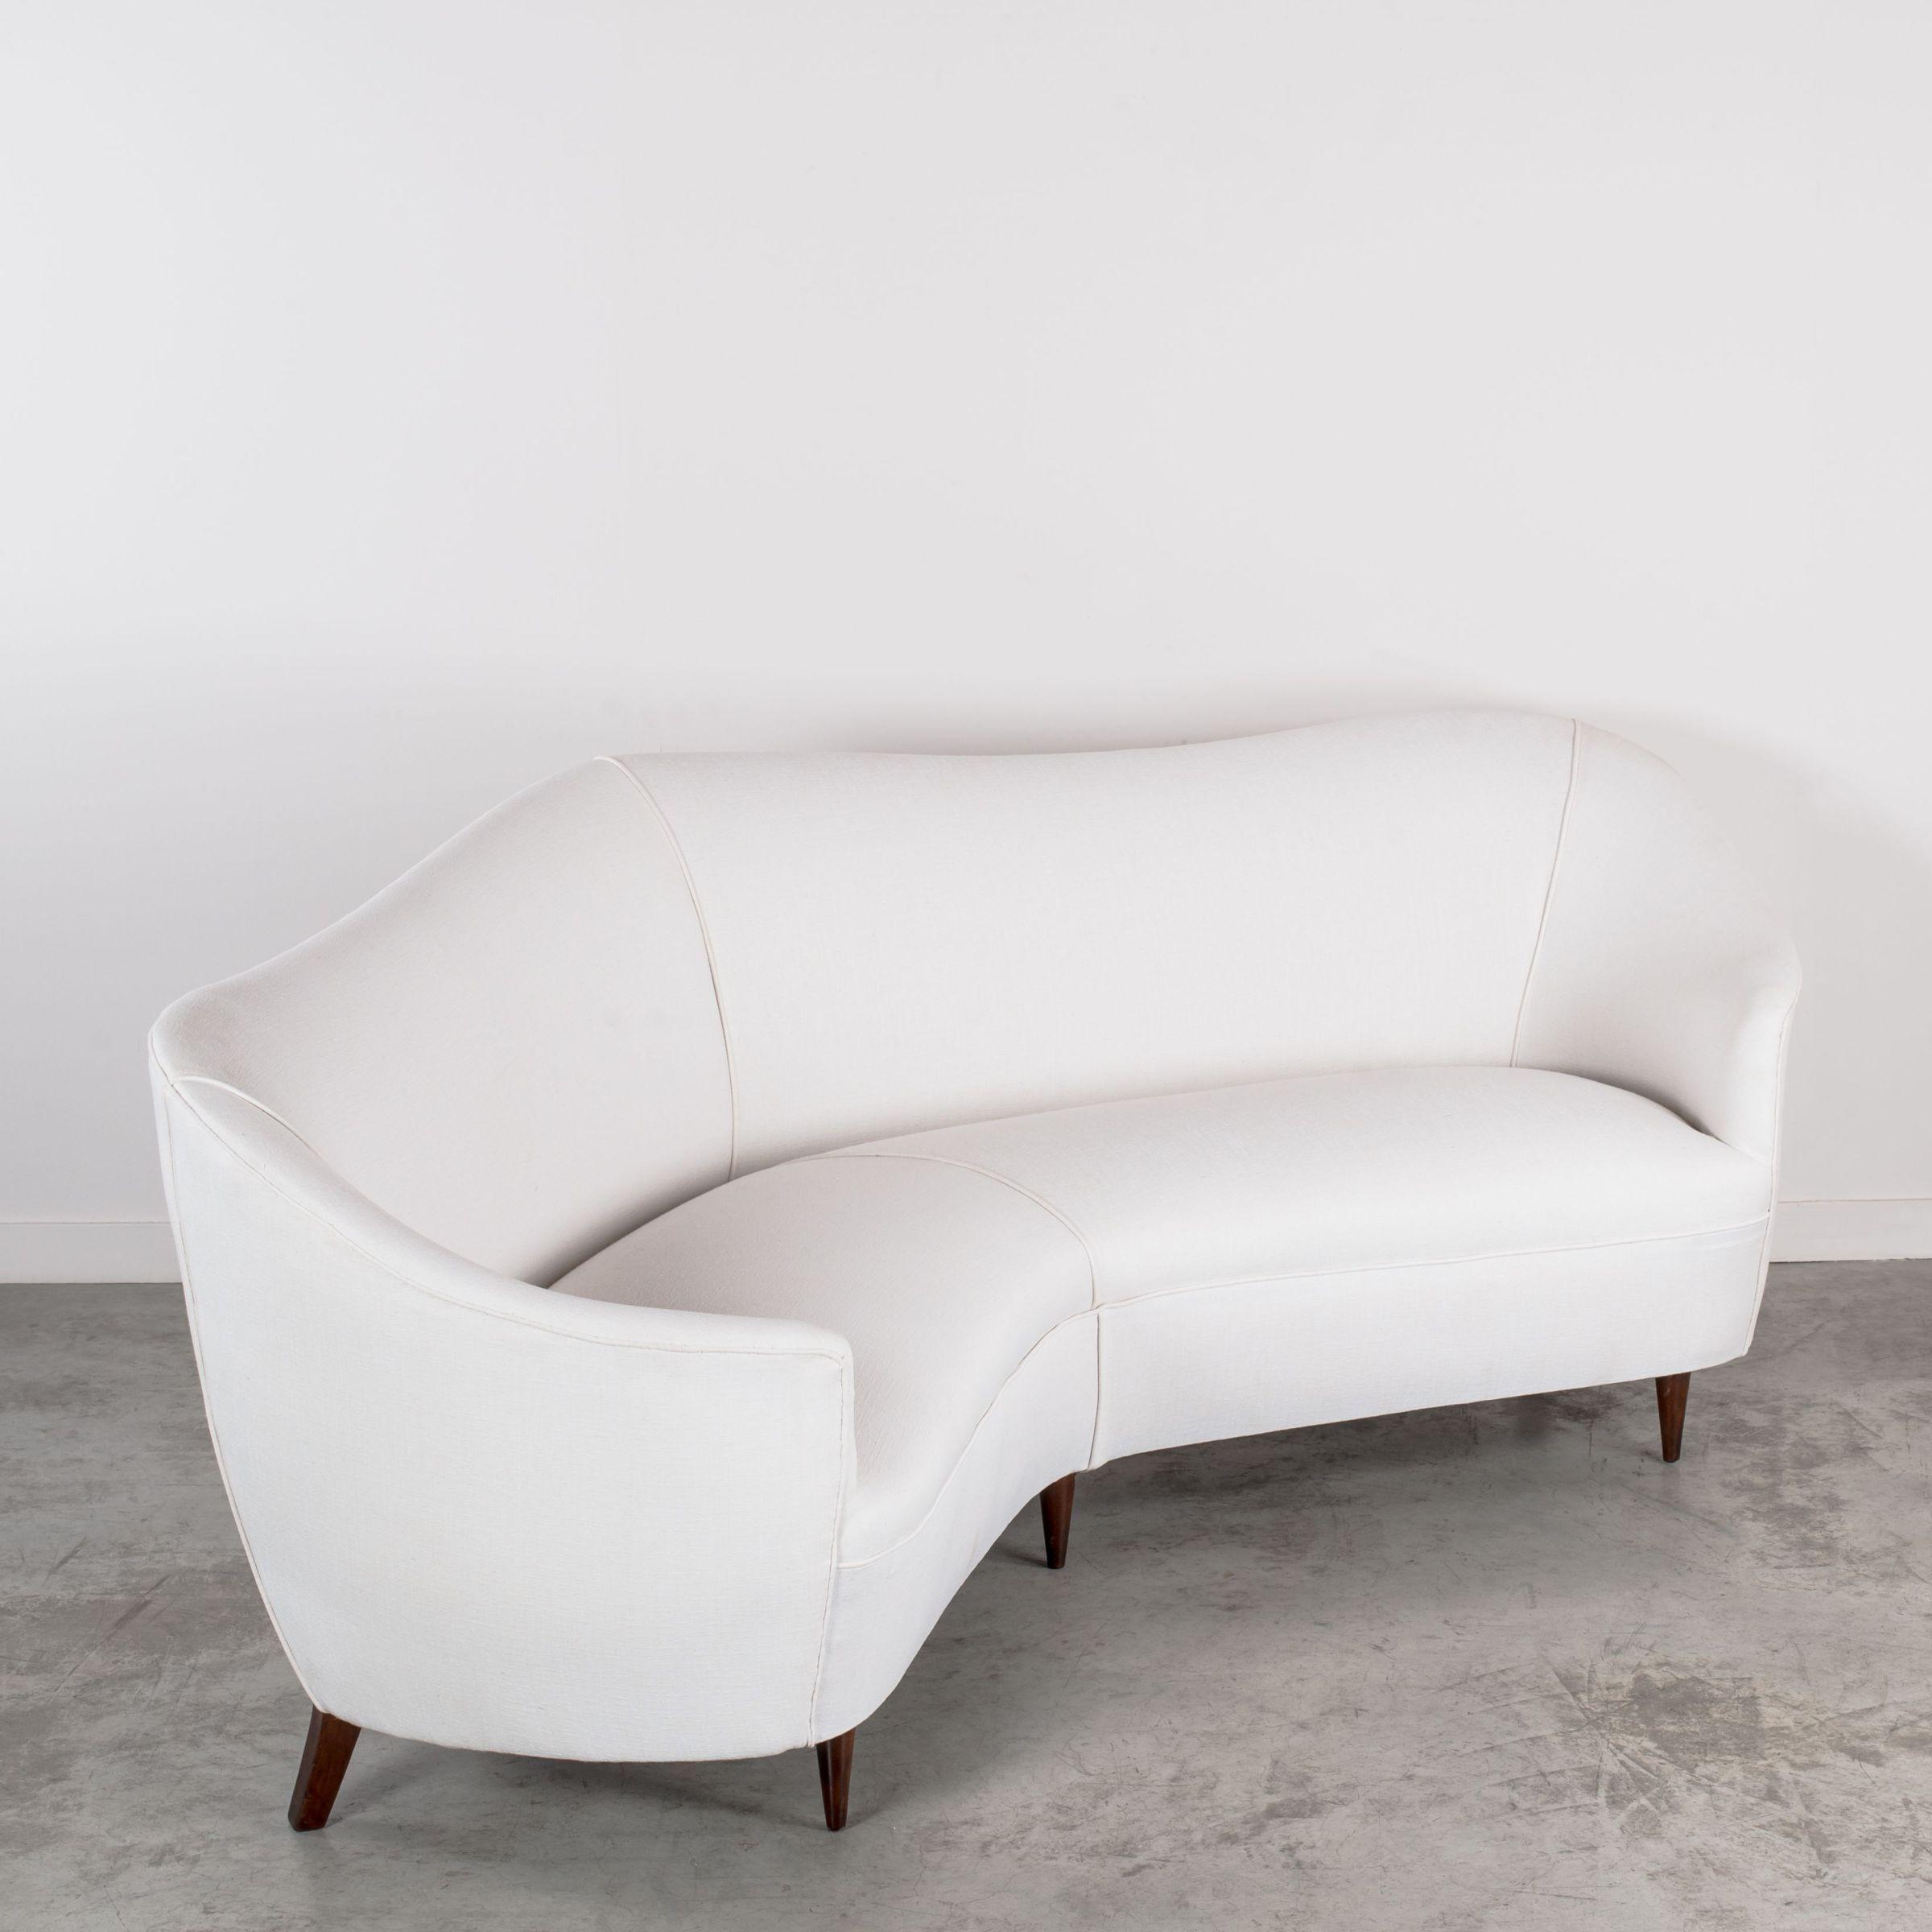 Gio Ponti; Sofa, 1938. | COUCHED | Pinterest | Sofa furniture ...